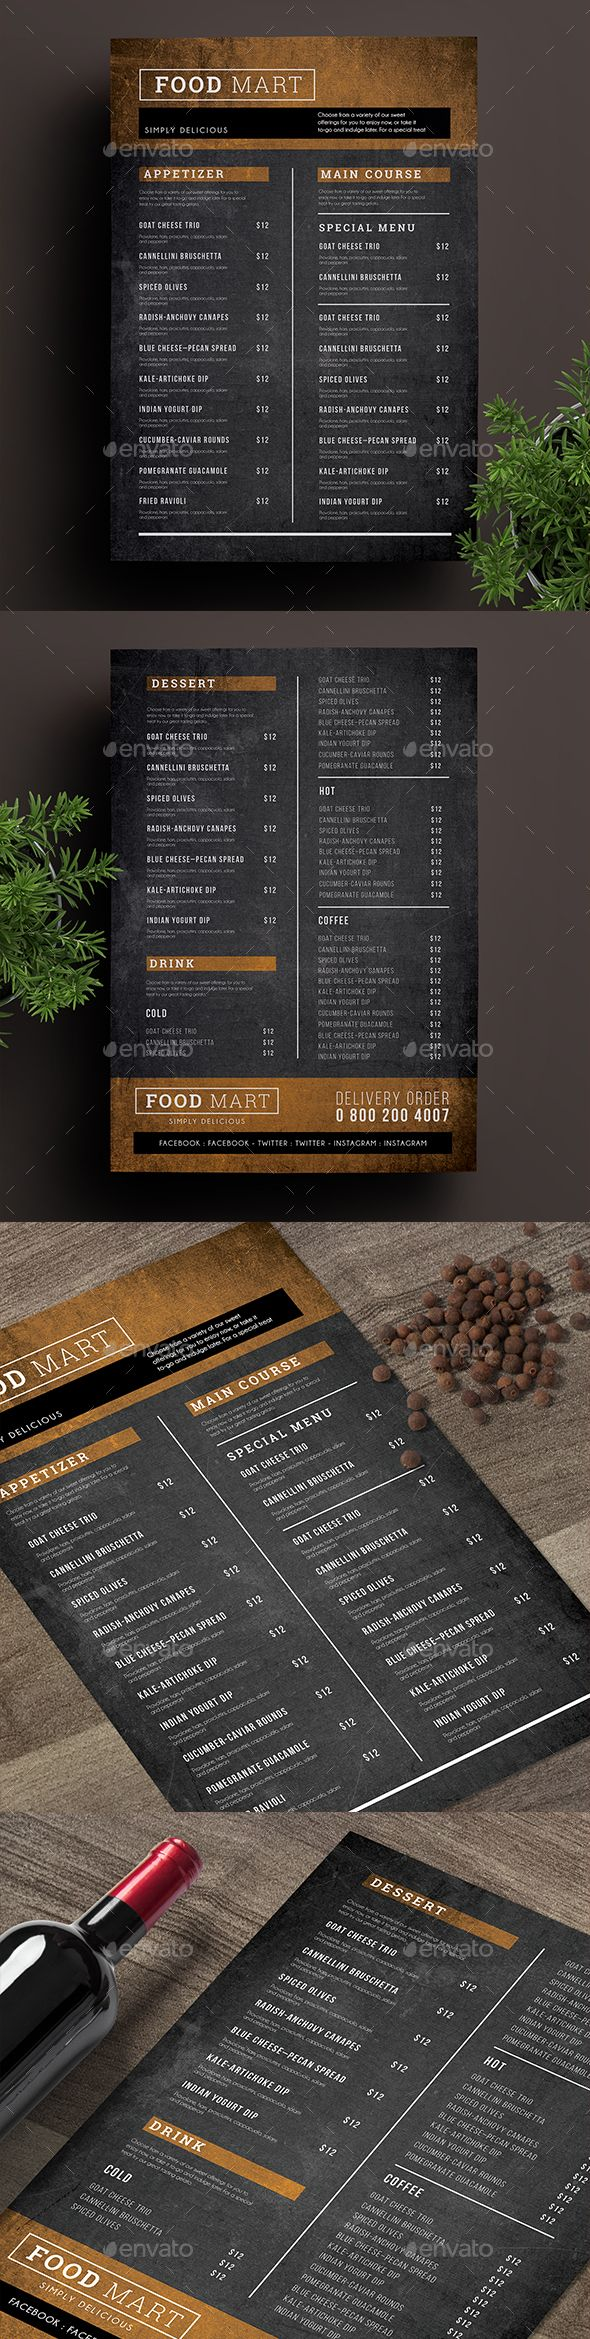 Simple Chalkboard Menu — Photoshop PSD #trifold #menu • Download ➝ https://graphicriver.net/item/simple-chalkboard-menu/19192804?ref=pxcr